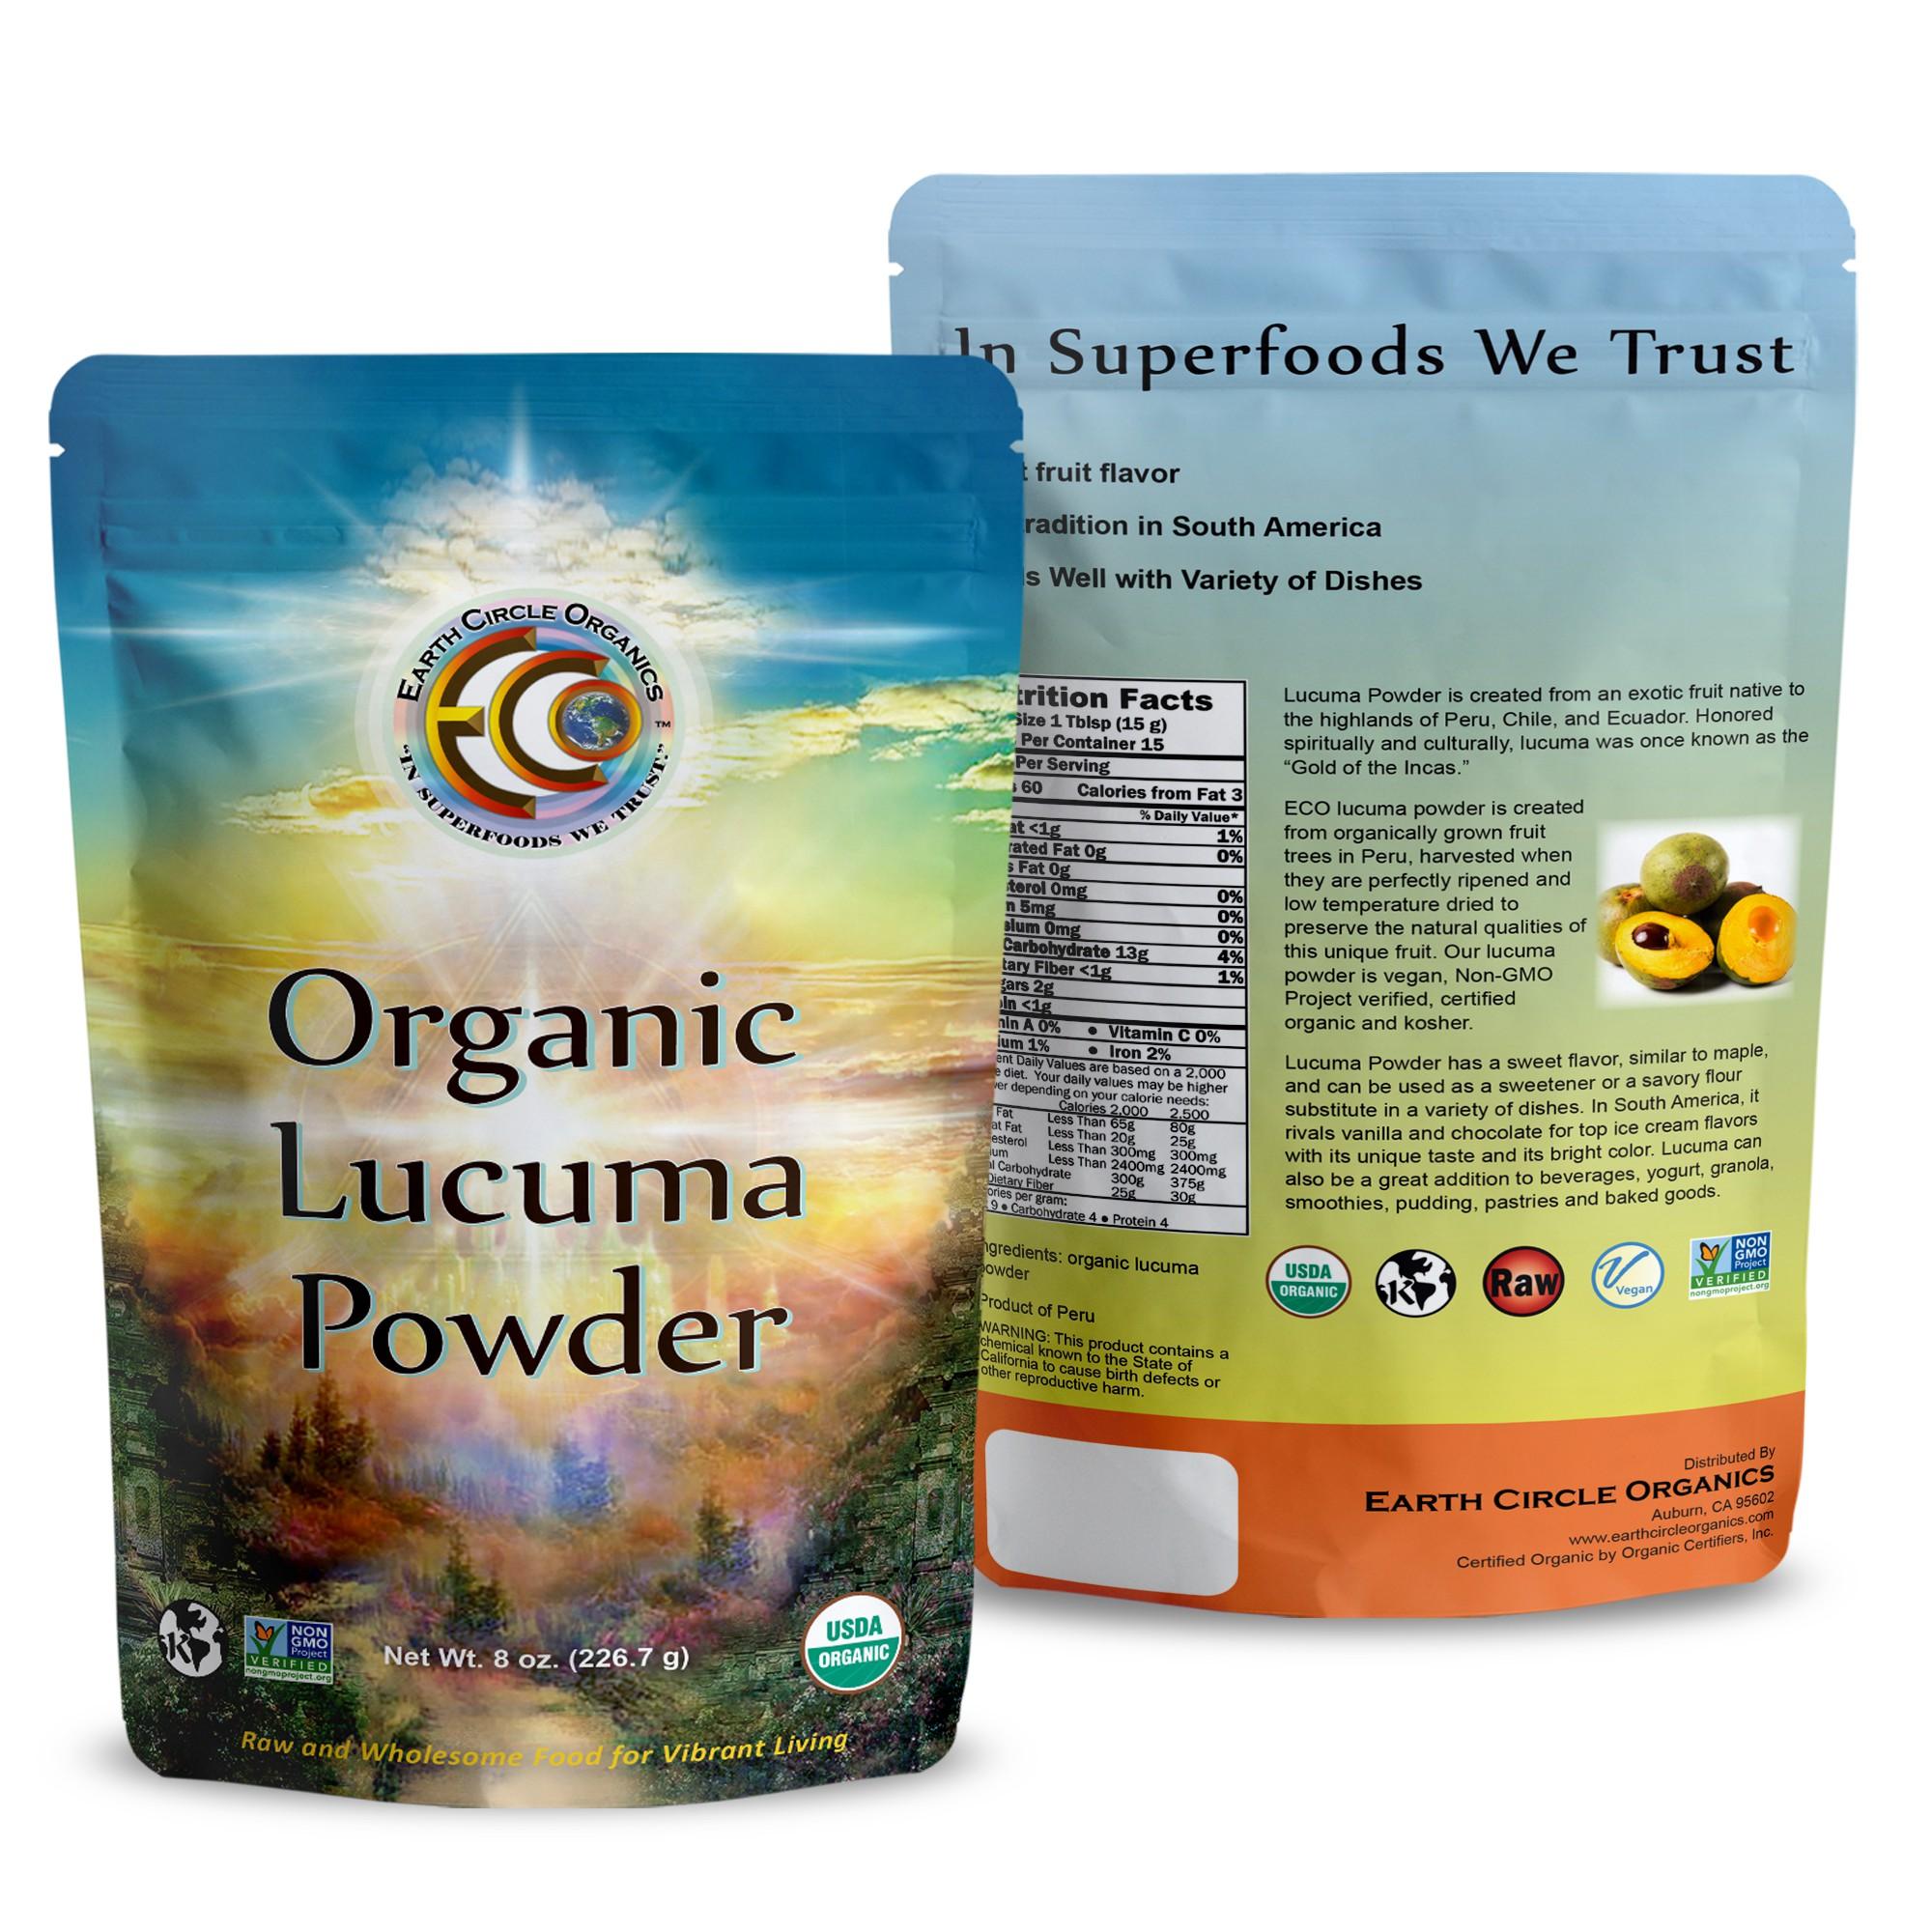 Earth Circle Organics Lucuma Rendered bag design